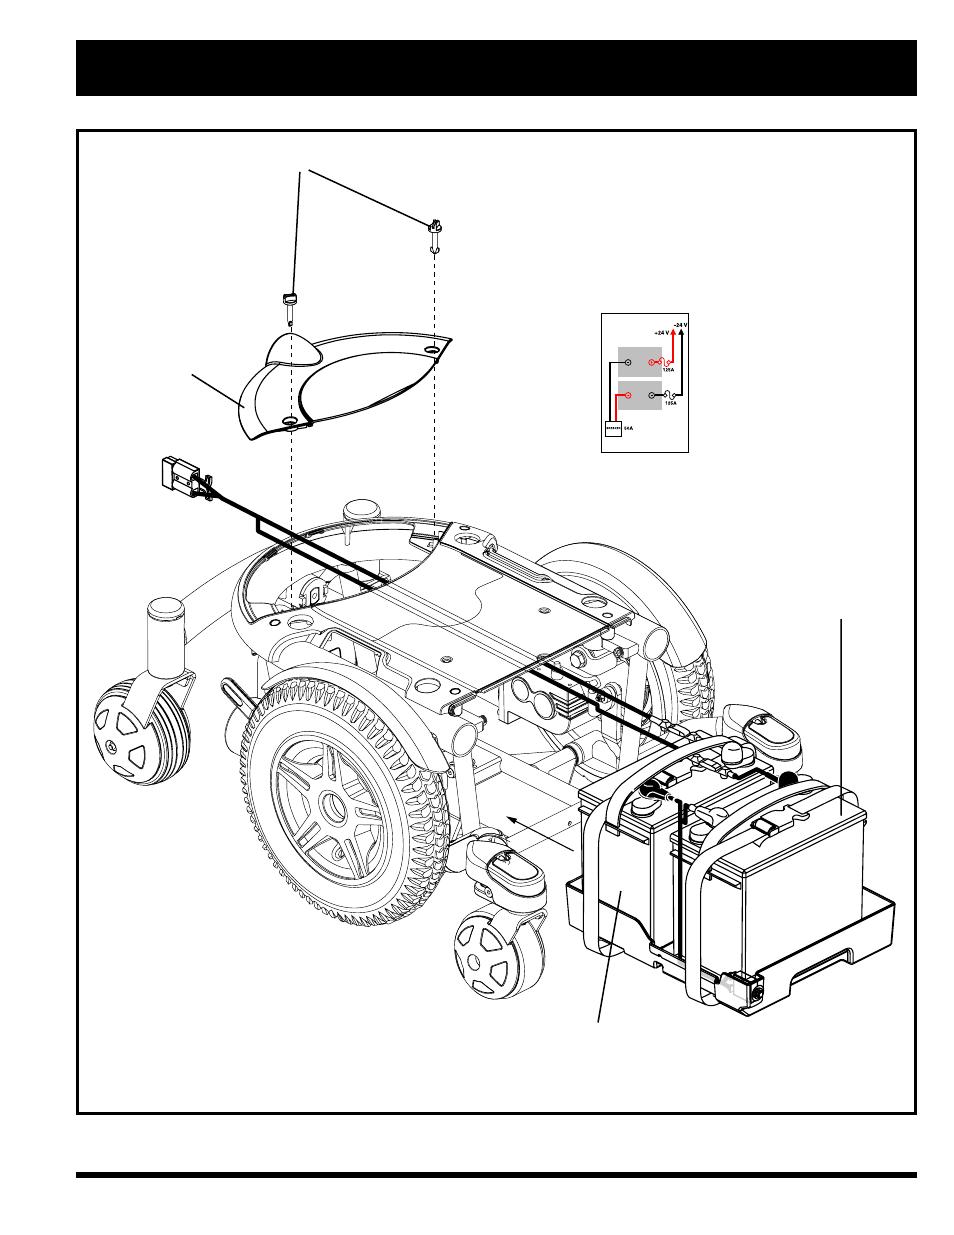 medium resolution of freedom mobility scooters wiring diagram wiring libraryjazzy 600 wiring diagram enthusiast wiring diagrams u2022 rh rasalibre